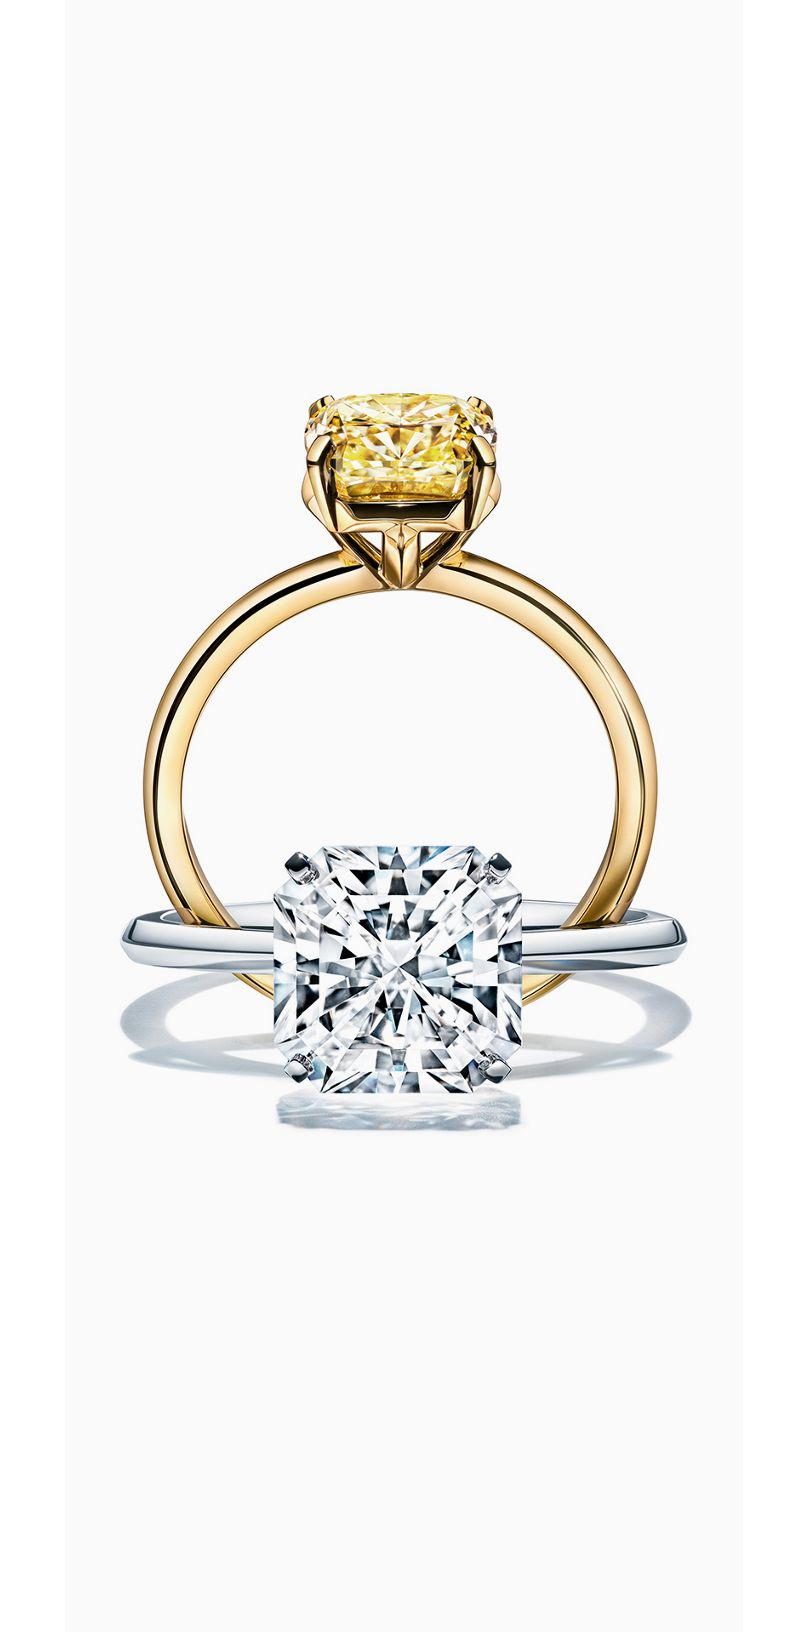 1192e965c10 Engagement Rings